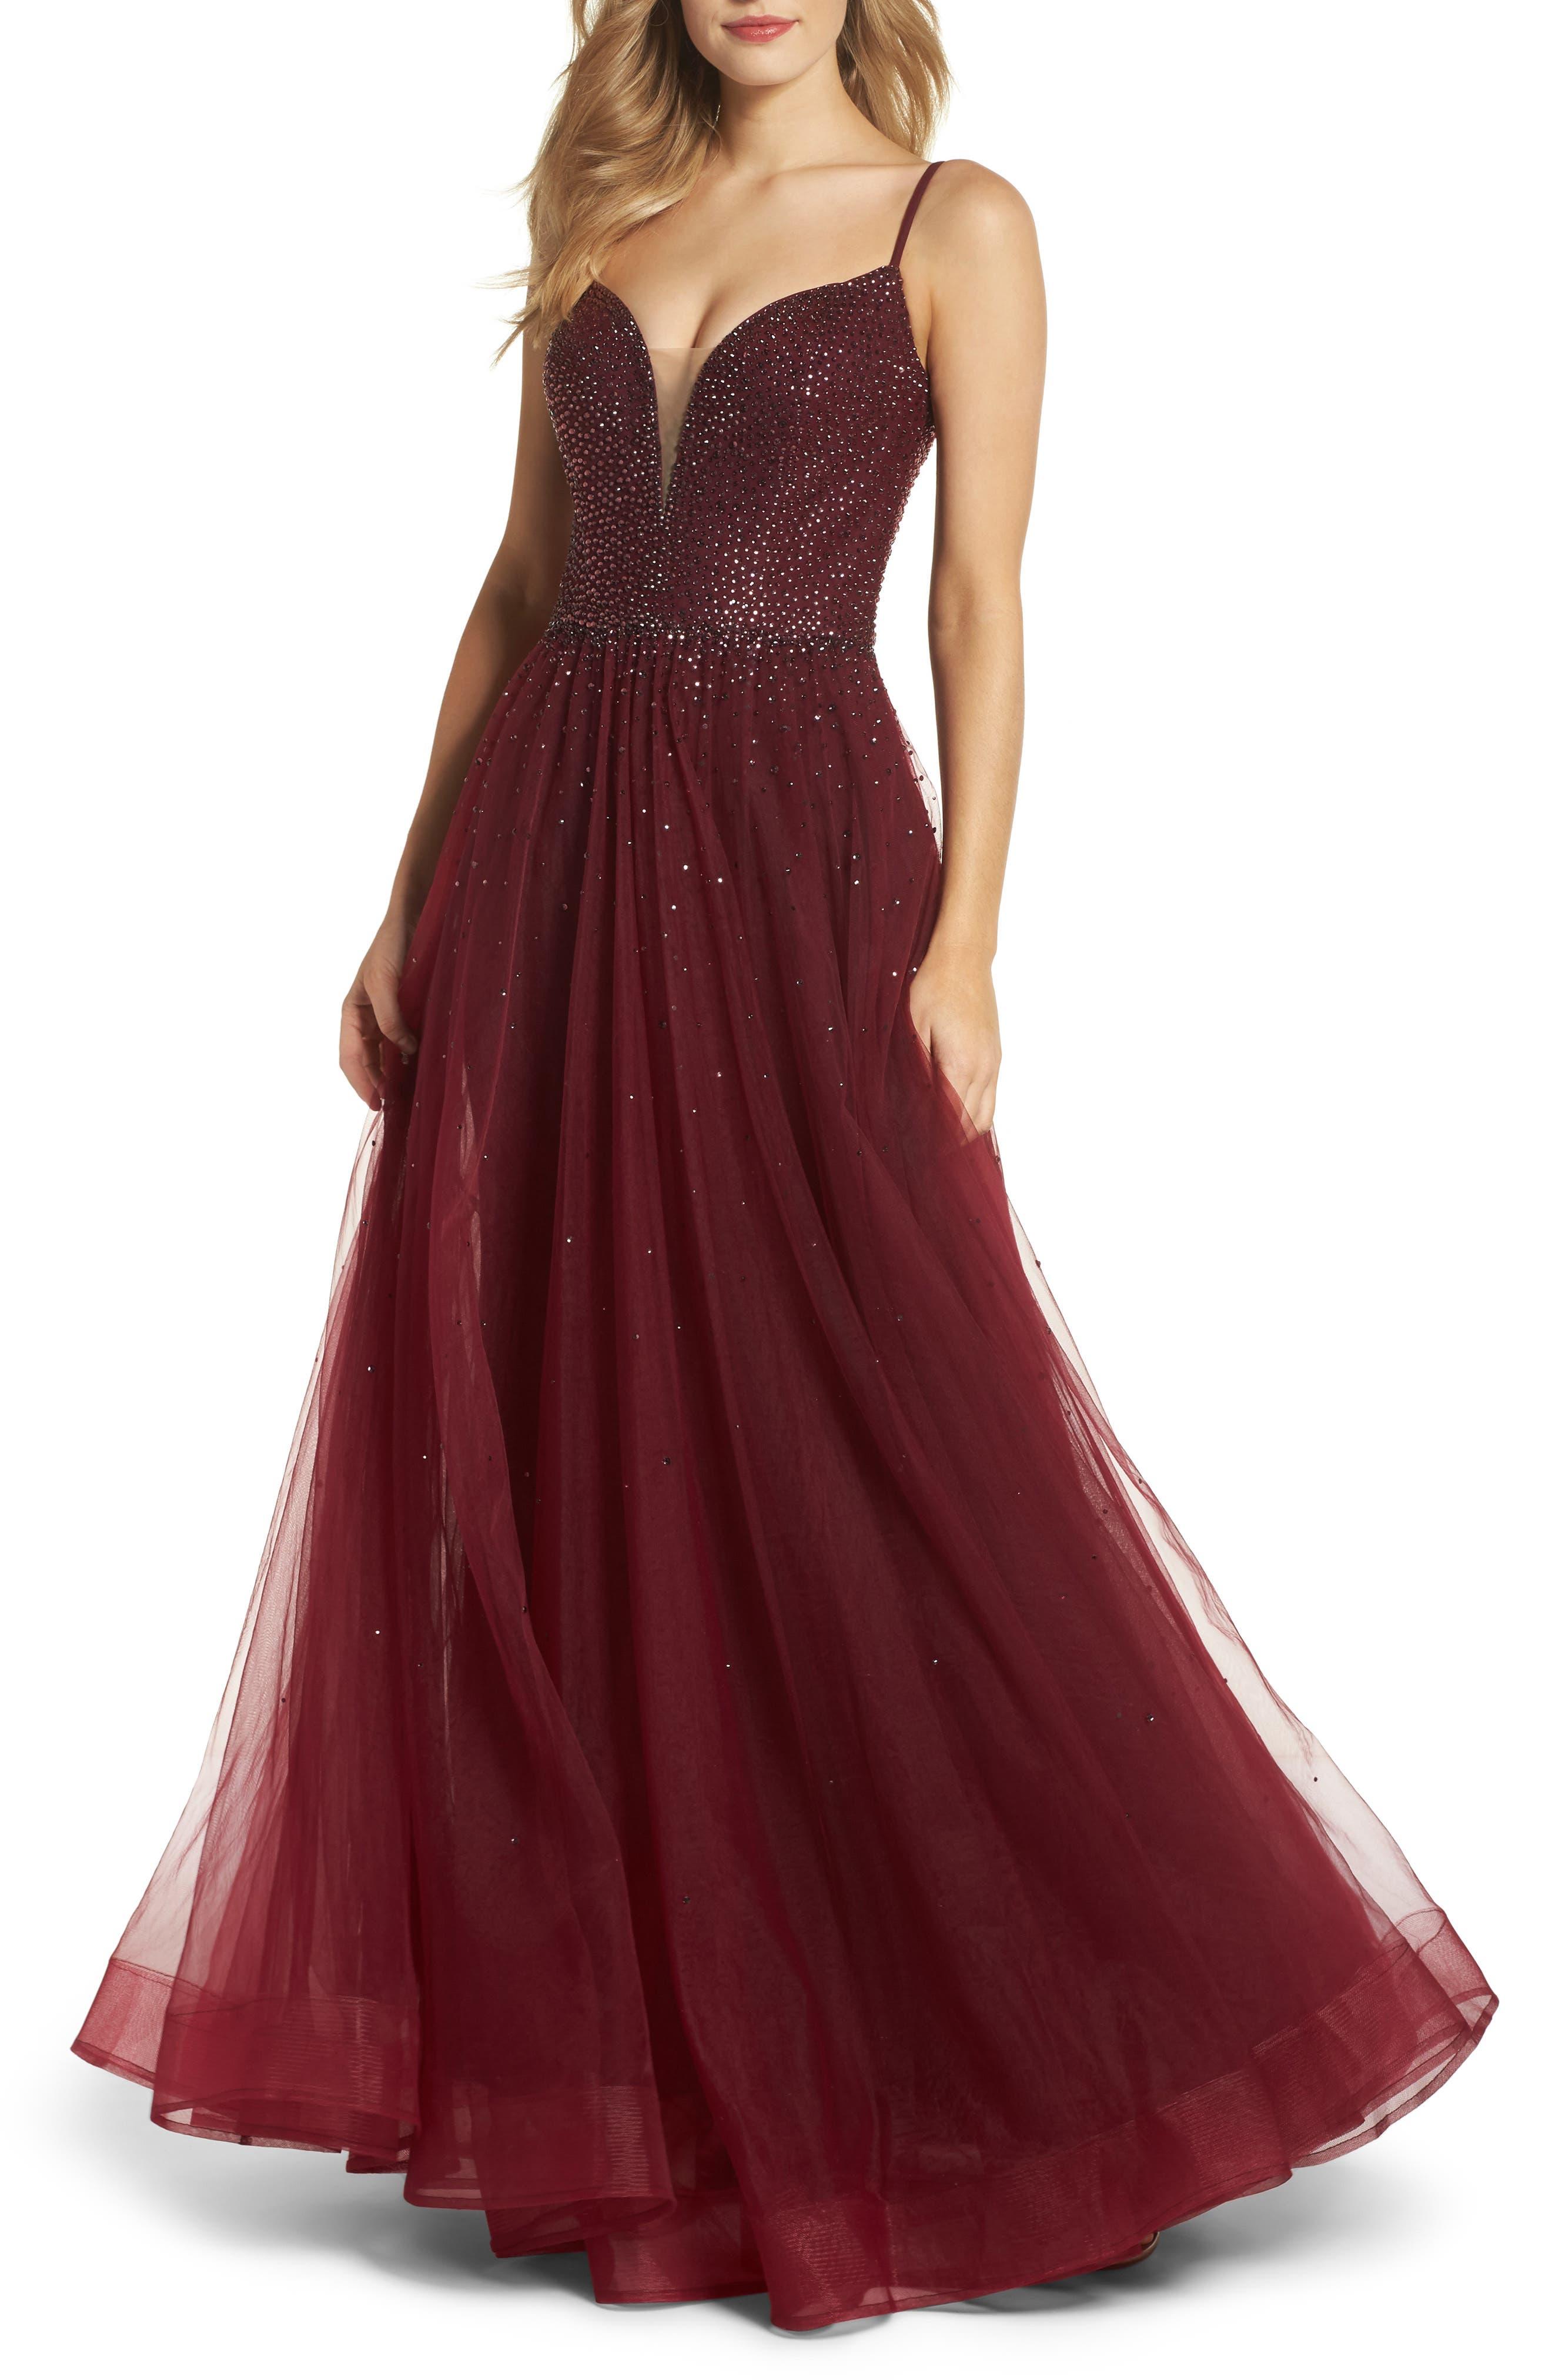 Main Image - La Femme Embellished Illusion Plunge Gown